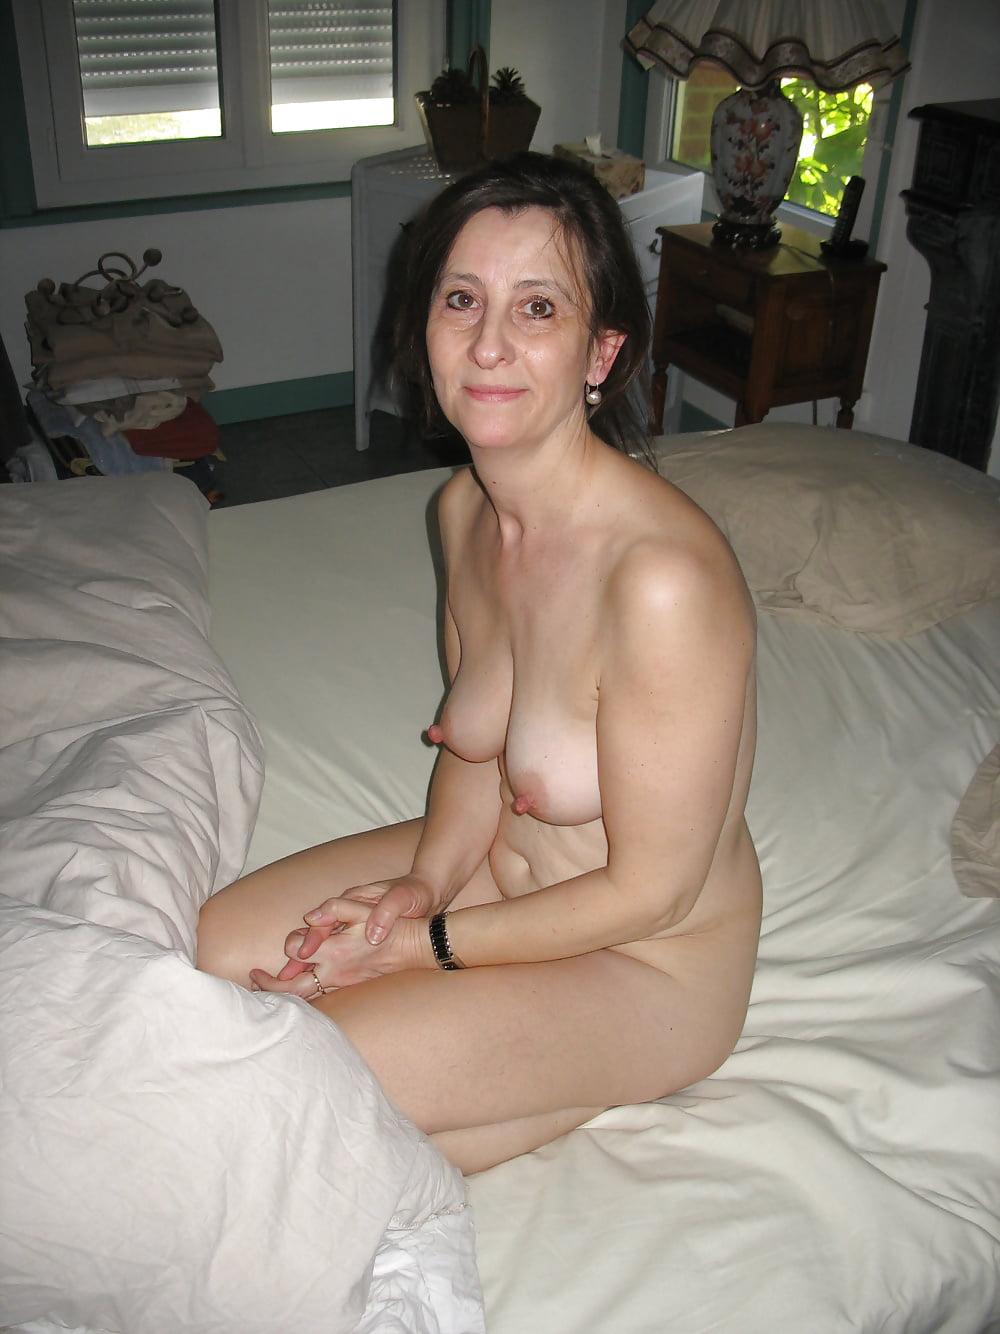 Exposed Flickr Wife Vera Porn Pics